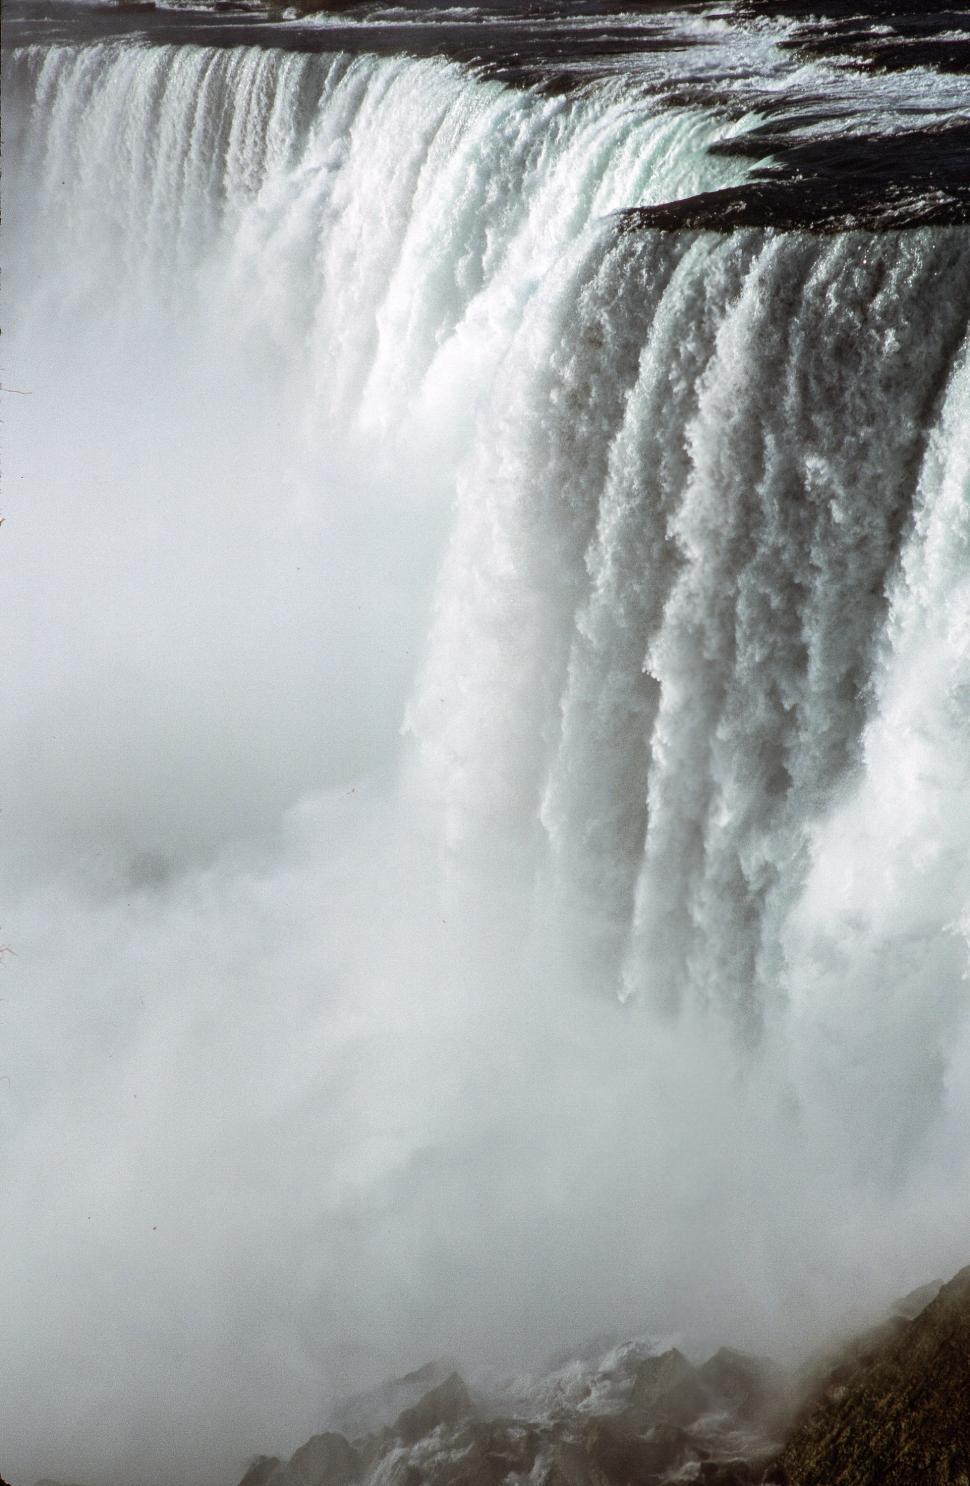 Download Free Stock HD Photo of Close View of Niagara Falls Online